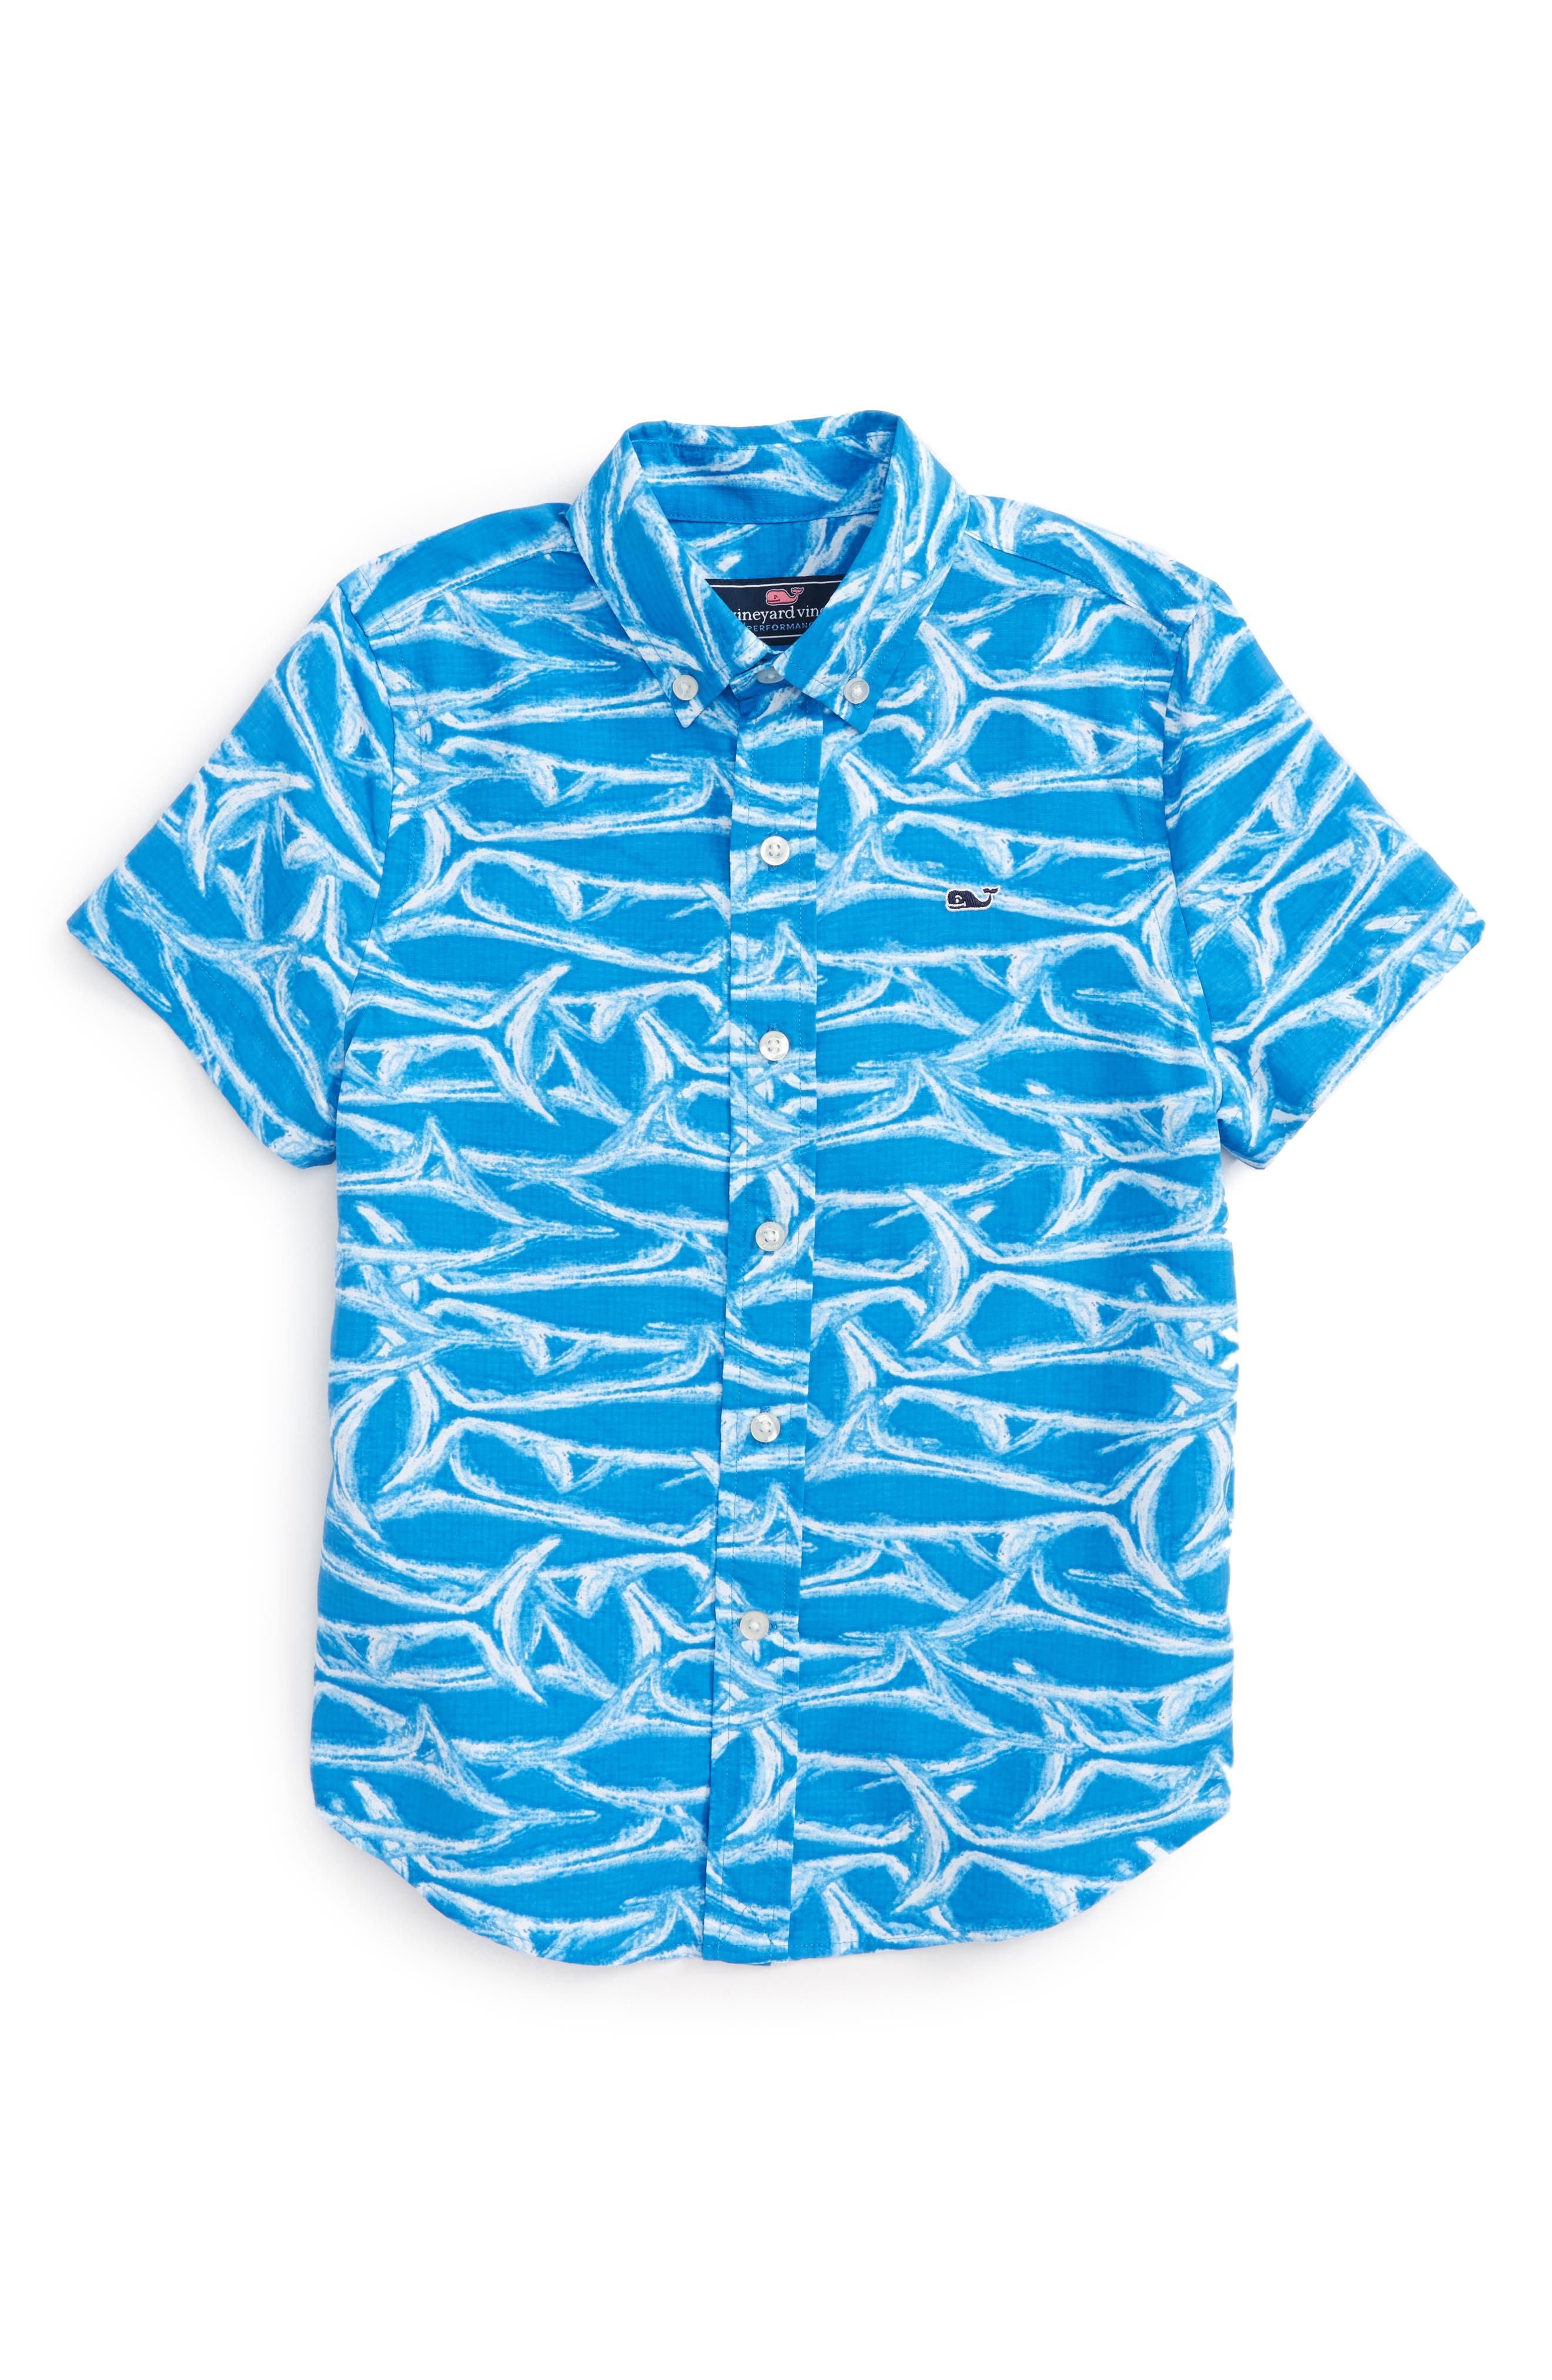 Main Image - vineyard vines Brushed Marlin Whale Shirt (Toddler Boys, Little Boys & Big Boys)